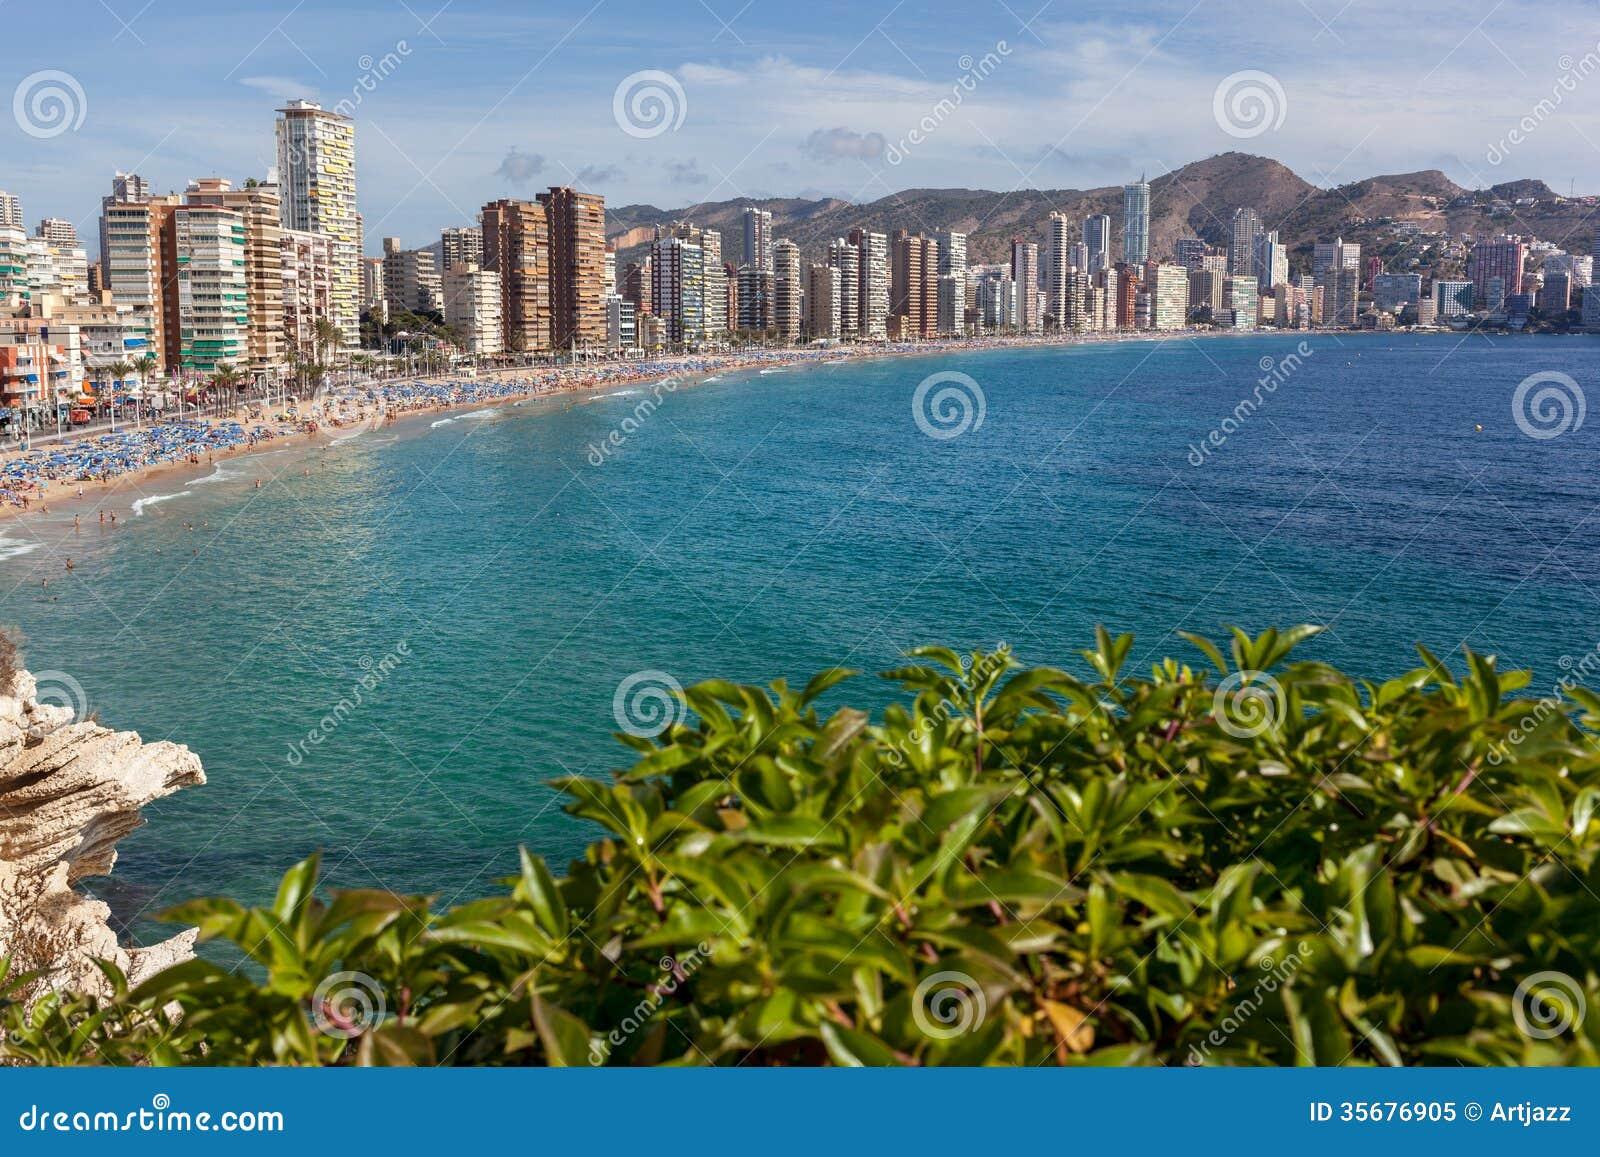 Benidorm - Costa Blanca Spain  city photos : View Of Benidorm, Costa Blanca, Spain Royalty Free Stock Photo Image ...